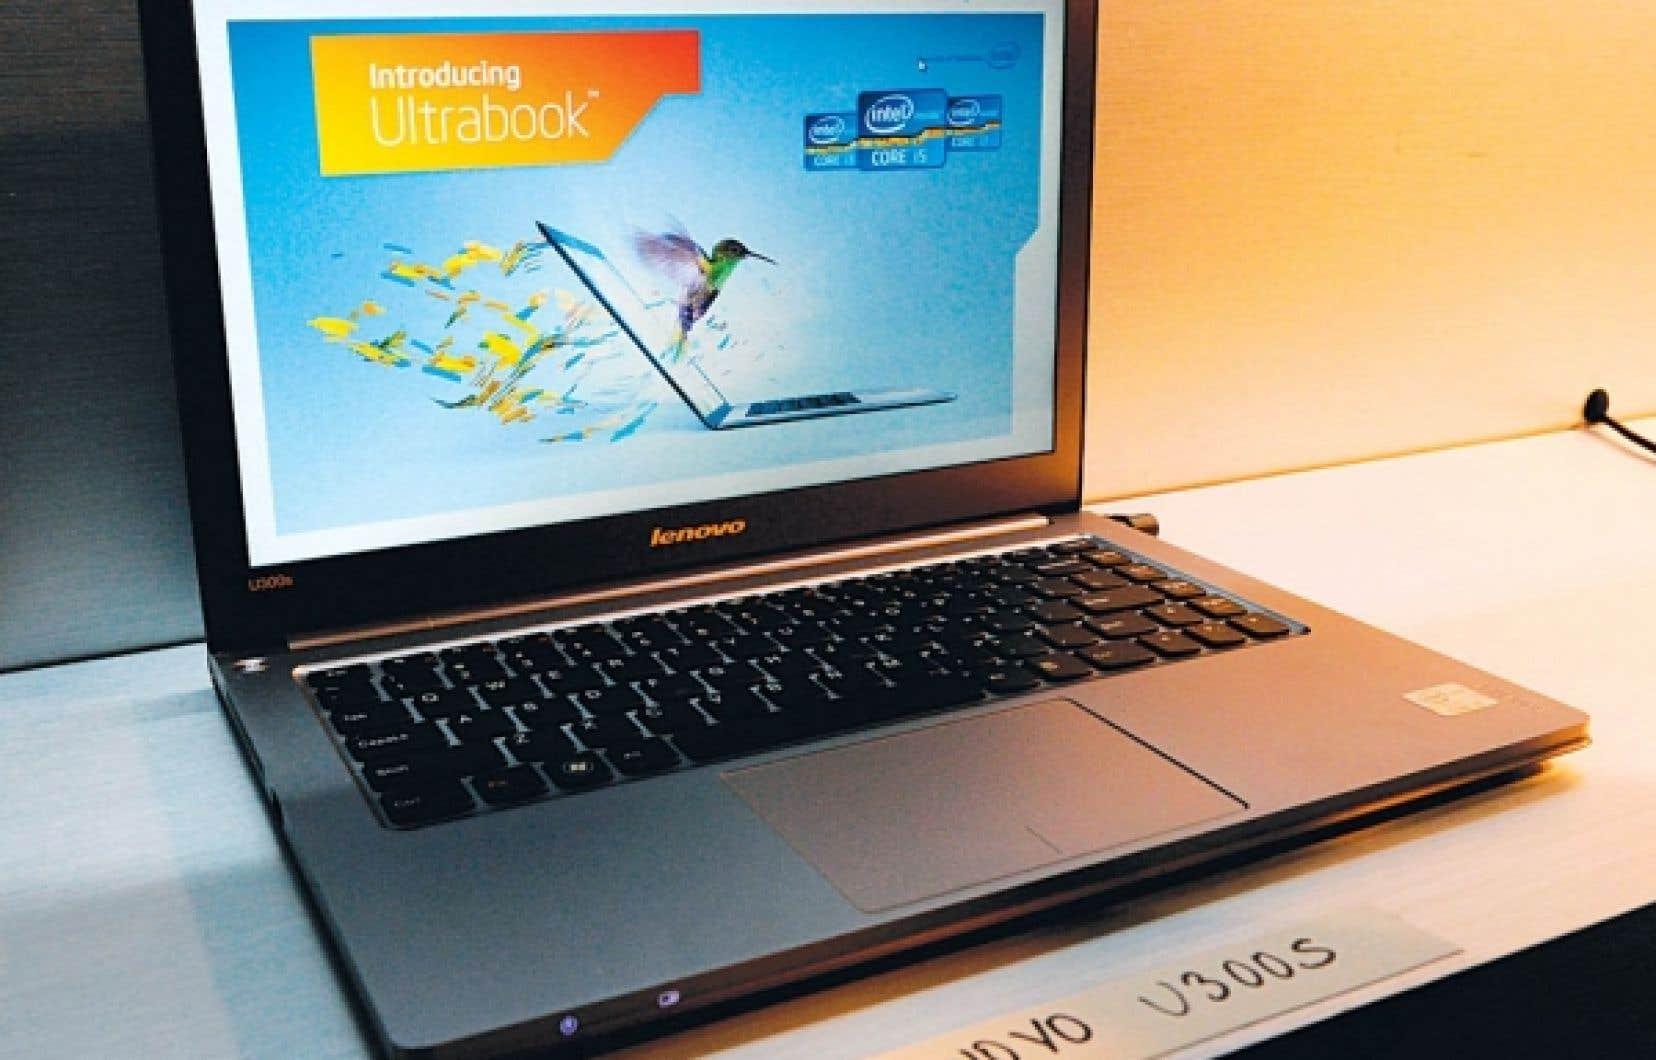 L'ultrabook Lenovo U300S d'Intel